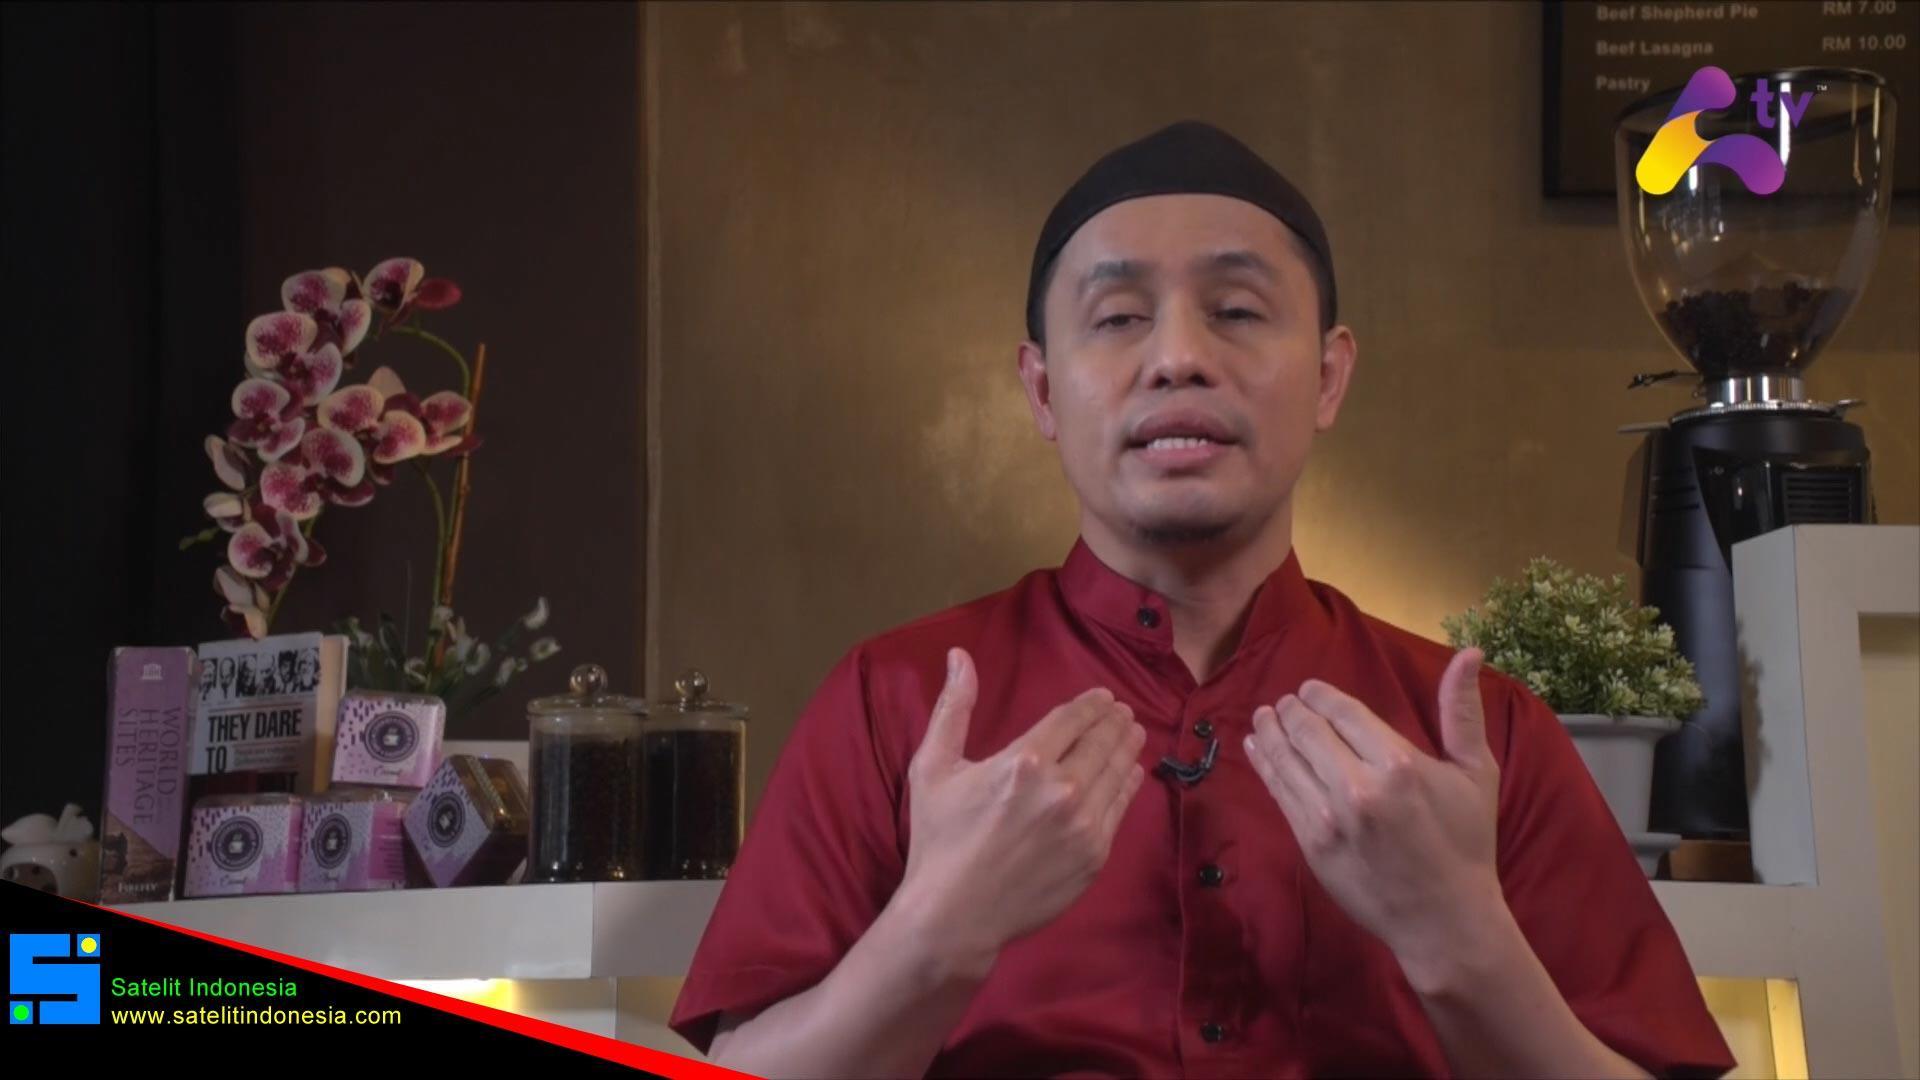 Frekuensi siaran Awesome TV HD di satelit AsiaSat 9 Terbaru